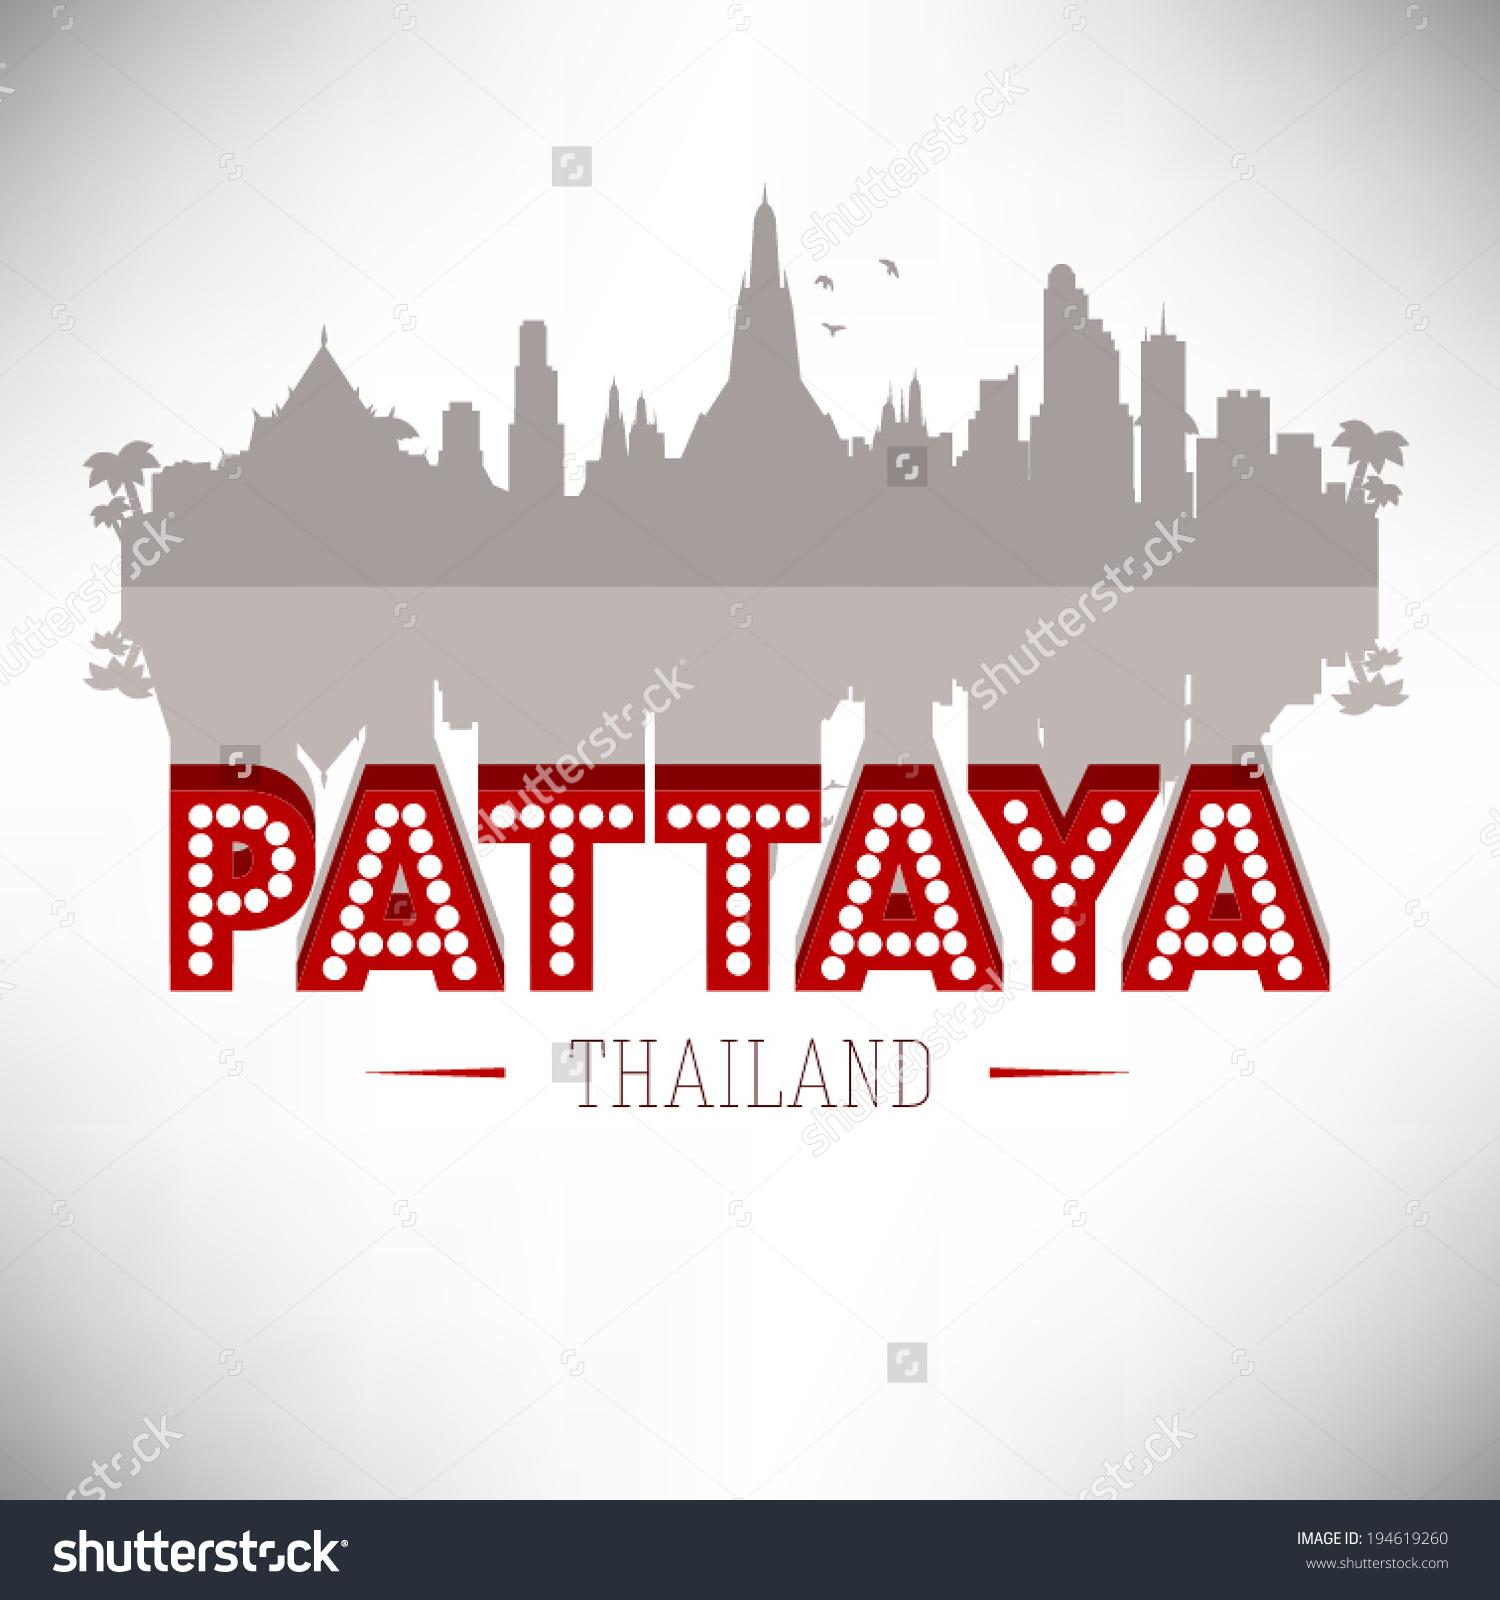 Pattaya Thailand Skyline Silhouette Vector Design Stock Vector.